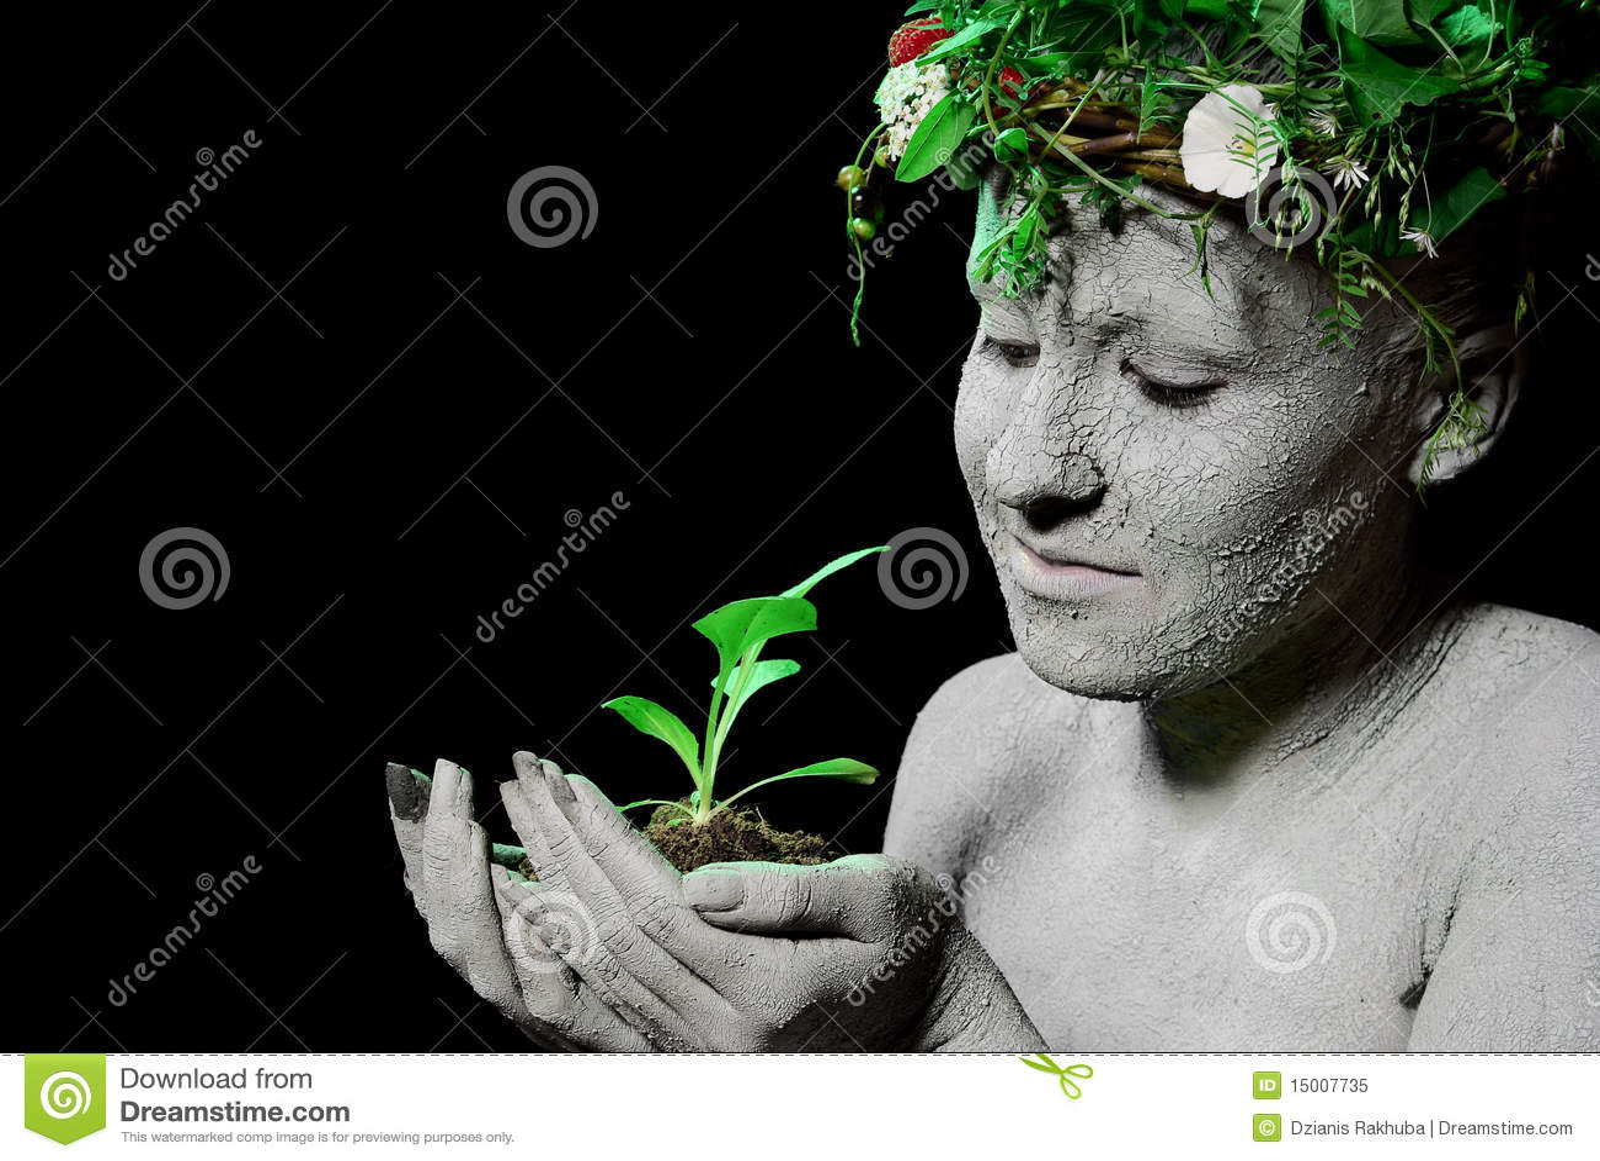 mother earth stock image image of make grow hand green 15007735. Black Bedroom Furniture Sets. Home Design Ideas